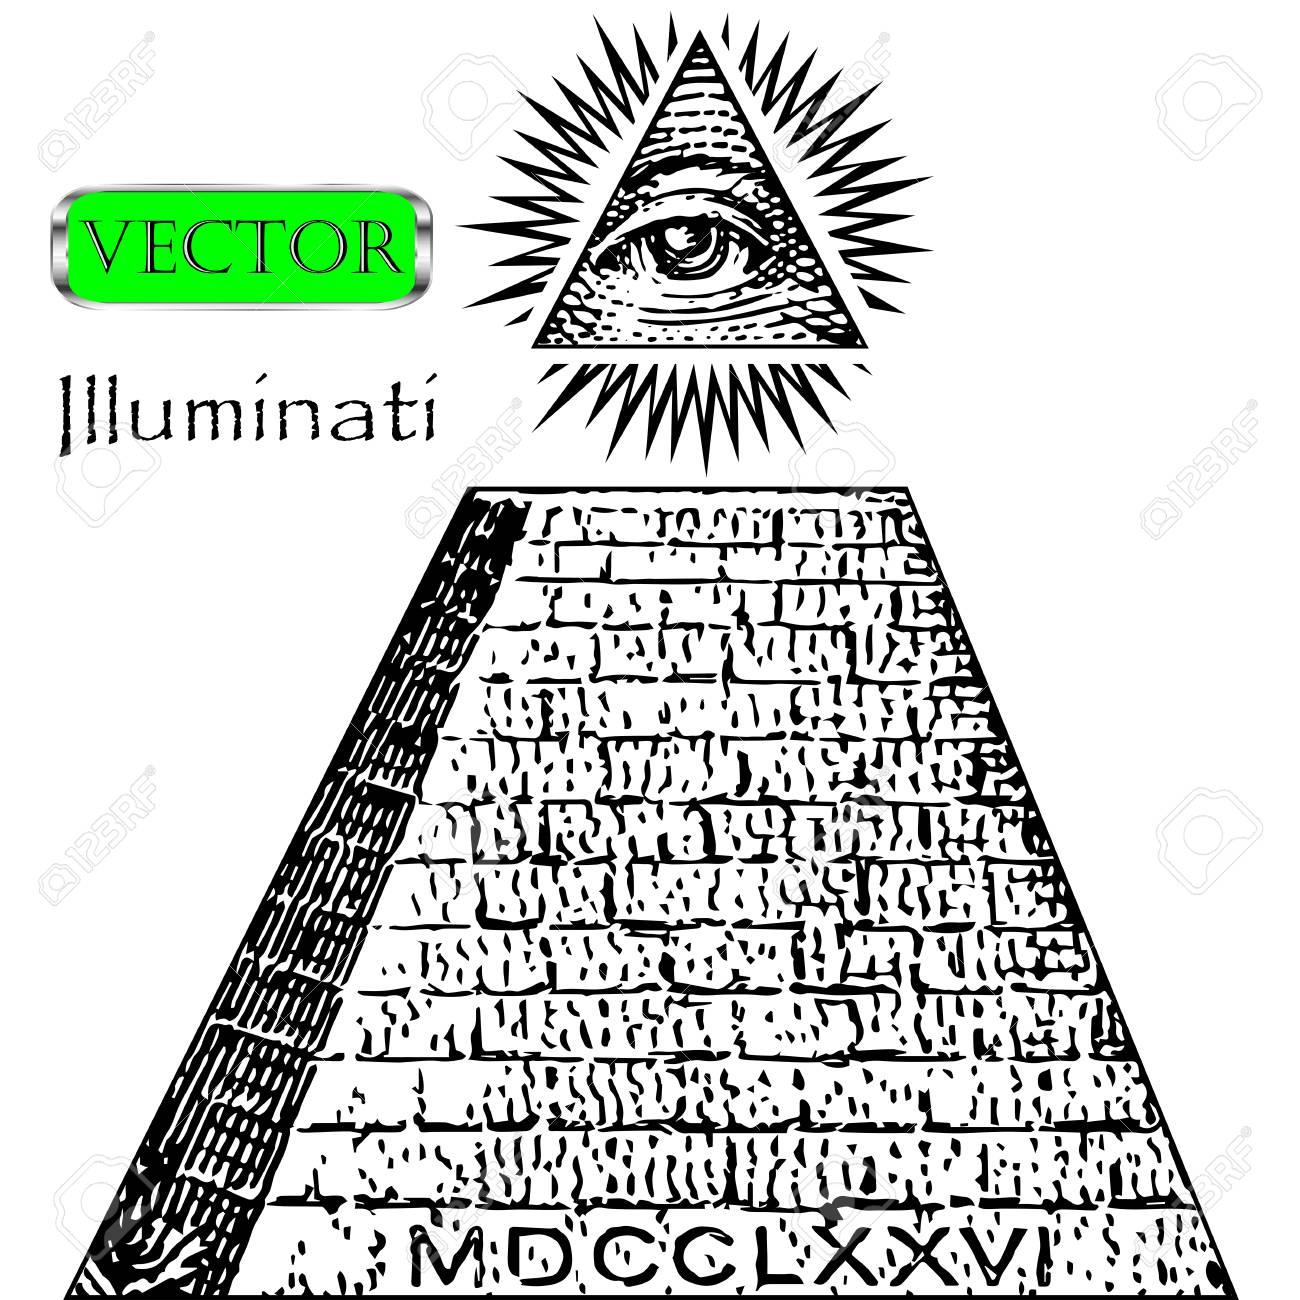 One dollar pyramid new world order illuminati symbols bill one dollar pyramid new world order illuminati symbols bill masonic sign buycottarizona Images